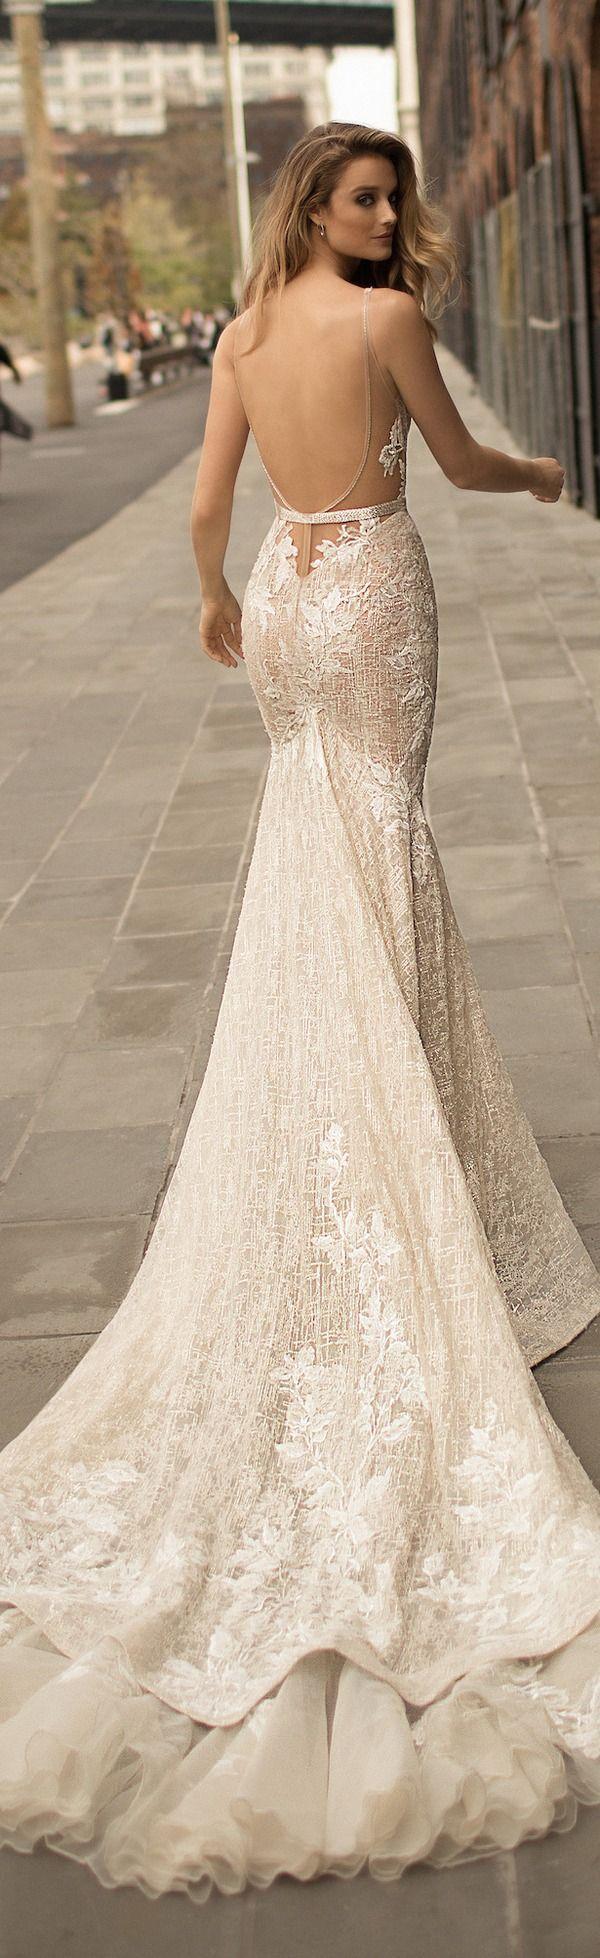 Berta Spring Wedding Dresses 2018